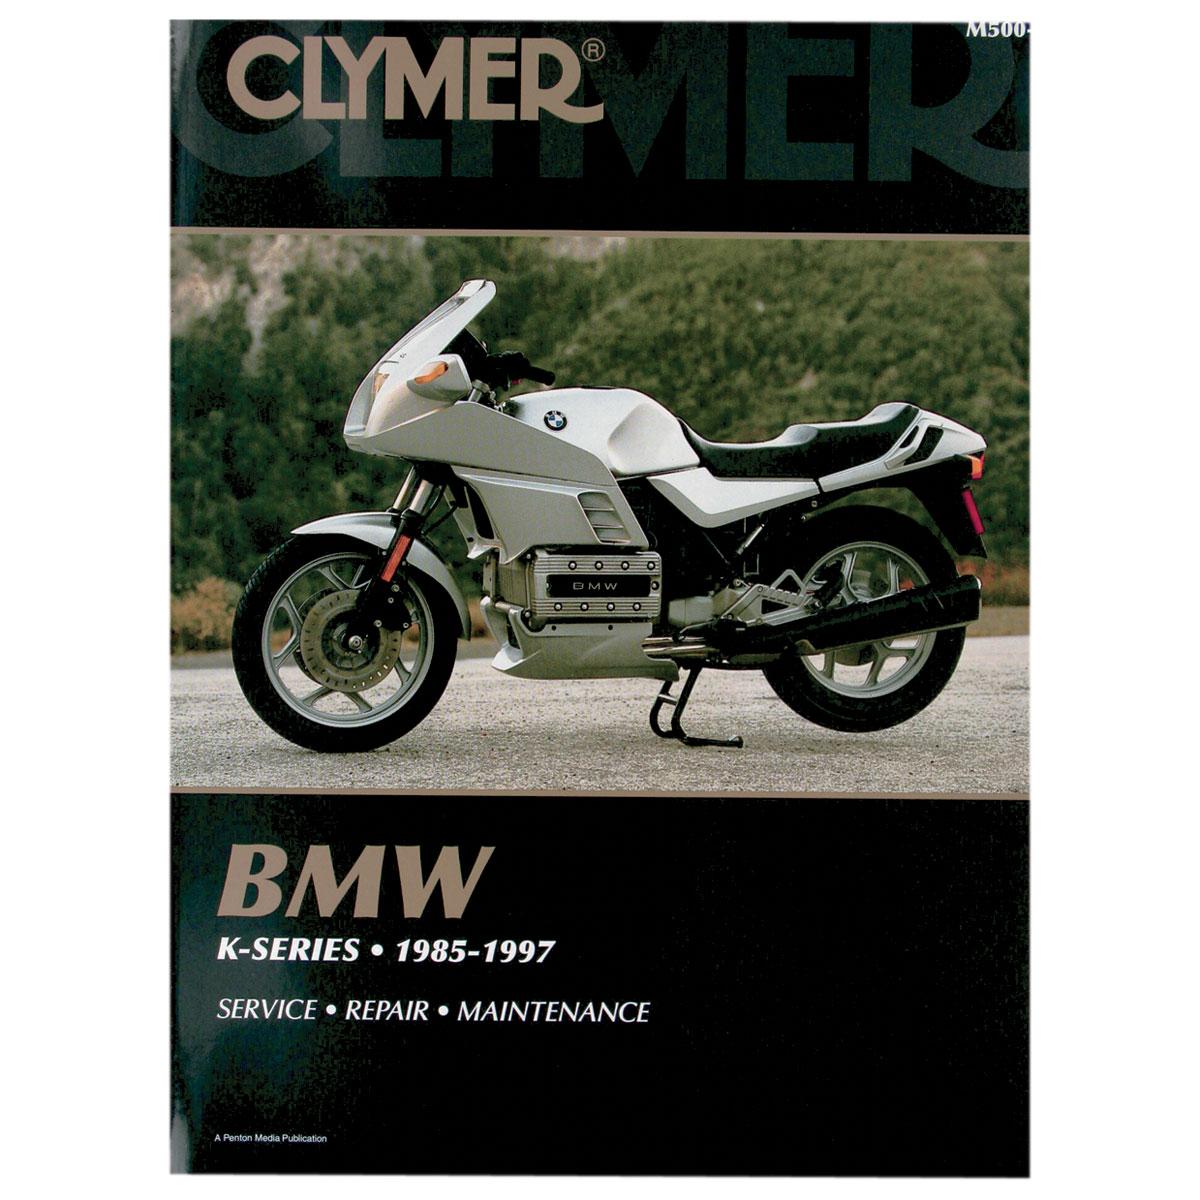 clymer bmw motorcycle repair manual 181 2344 j p cycles rh jpcycles com bmw motorcycle manual downloads bmw motorcycles manuals